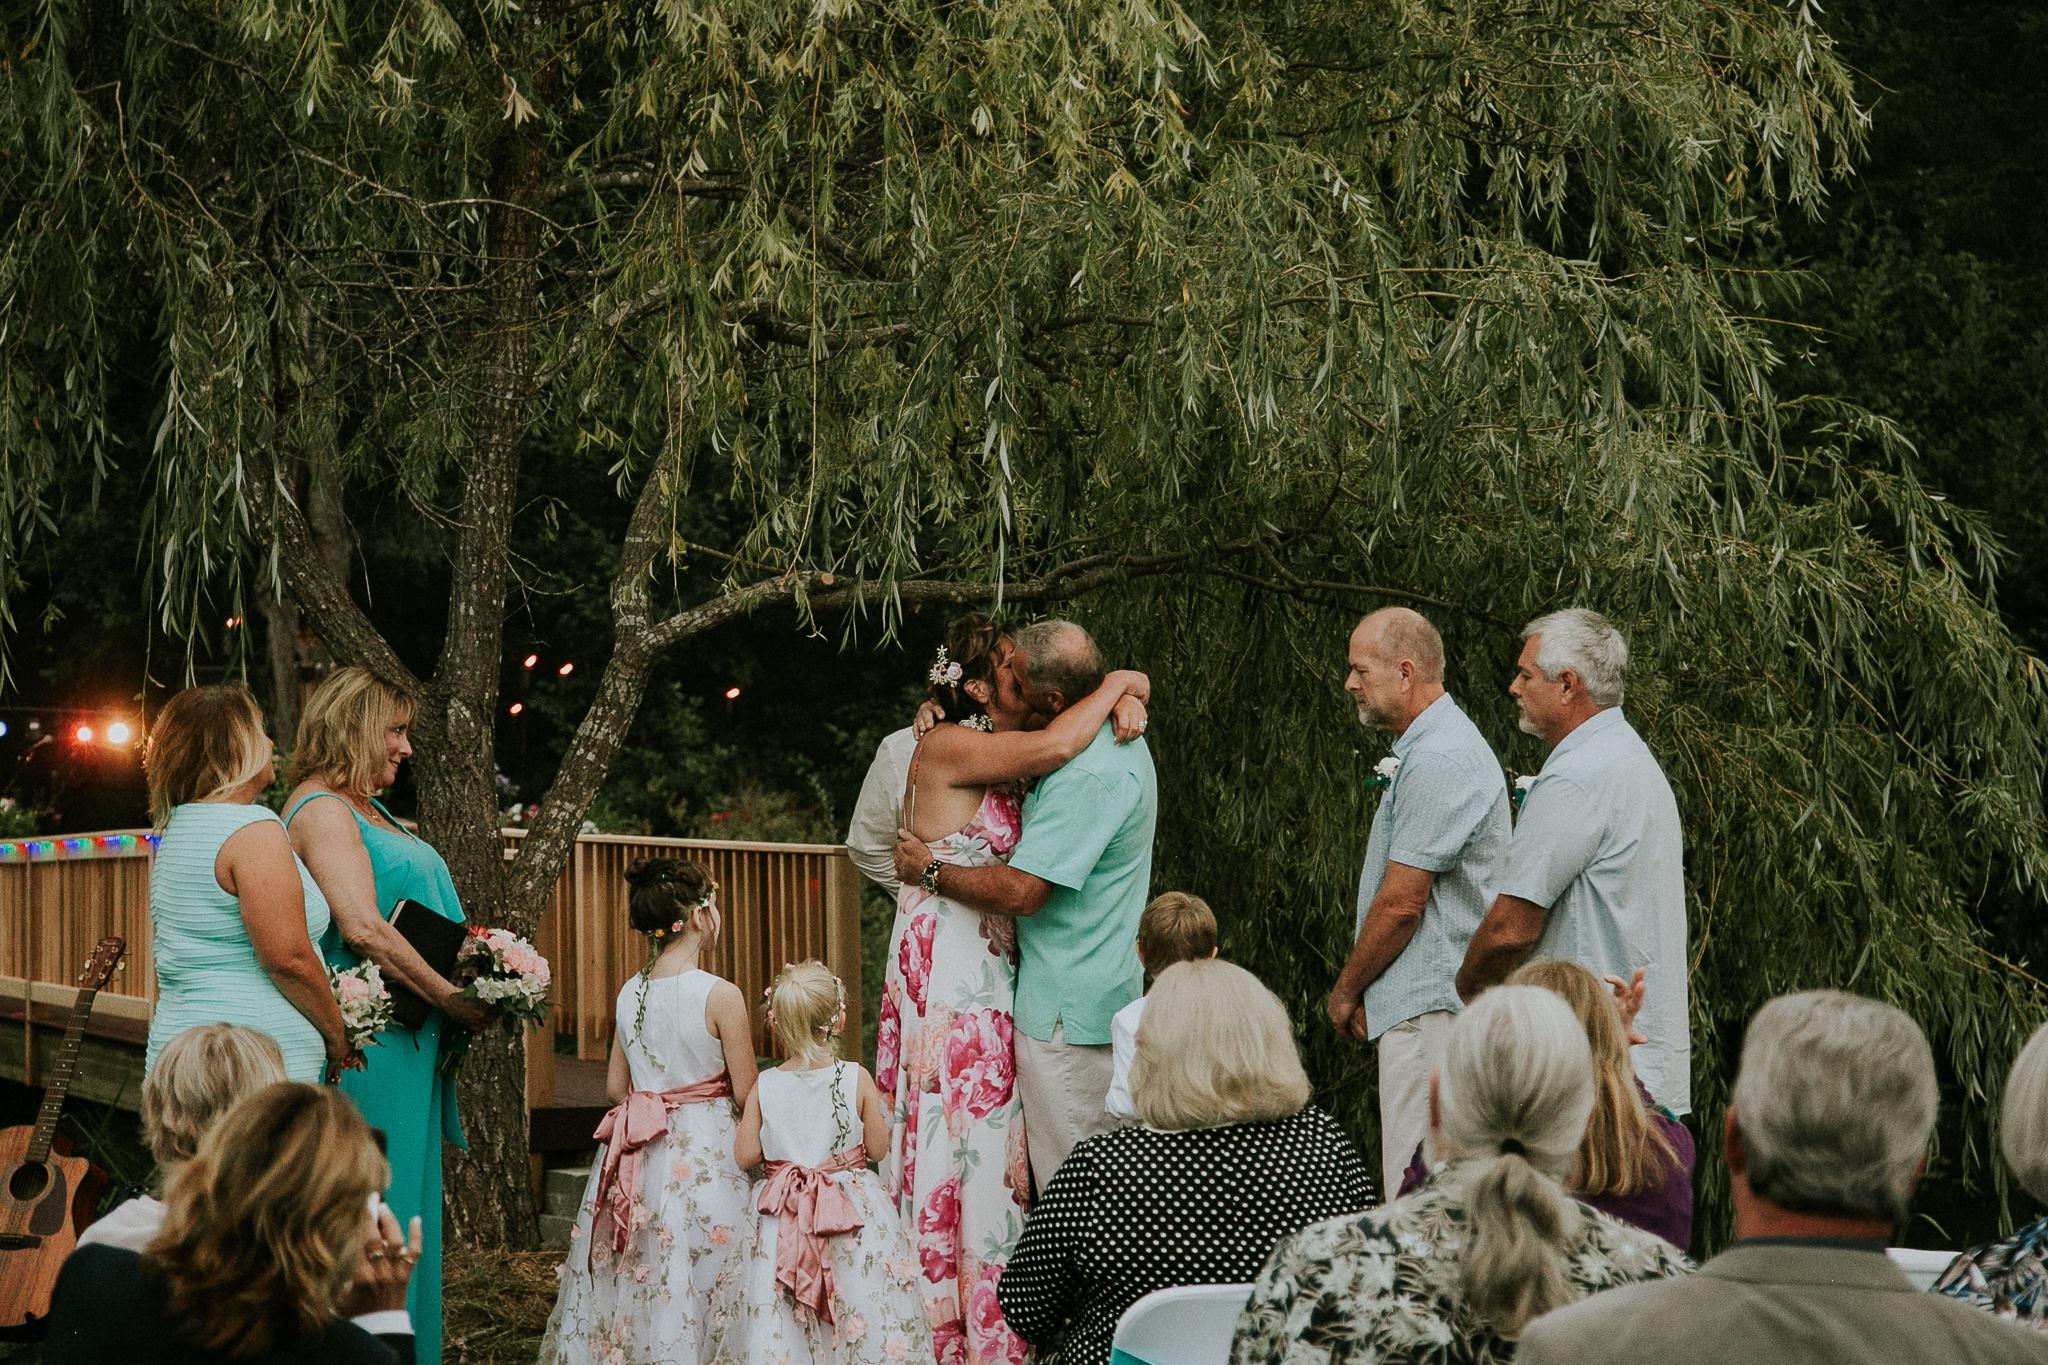 Backyard-Elopement-Ceremony-101.jpg